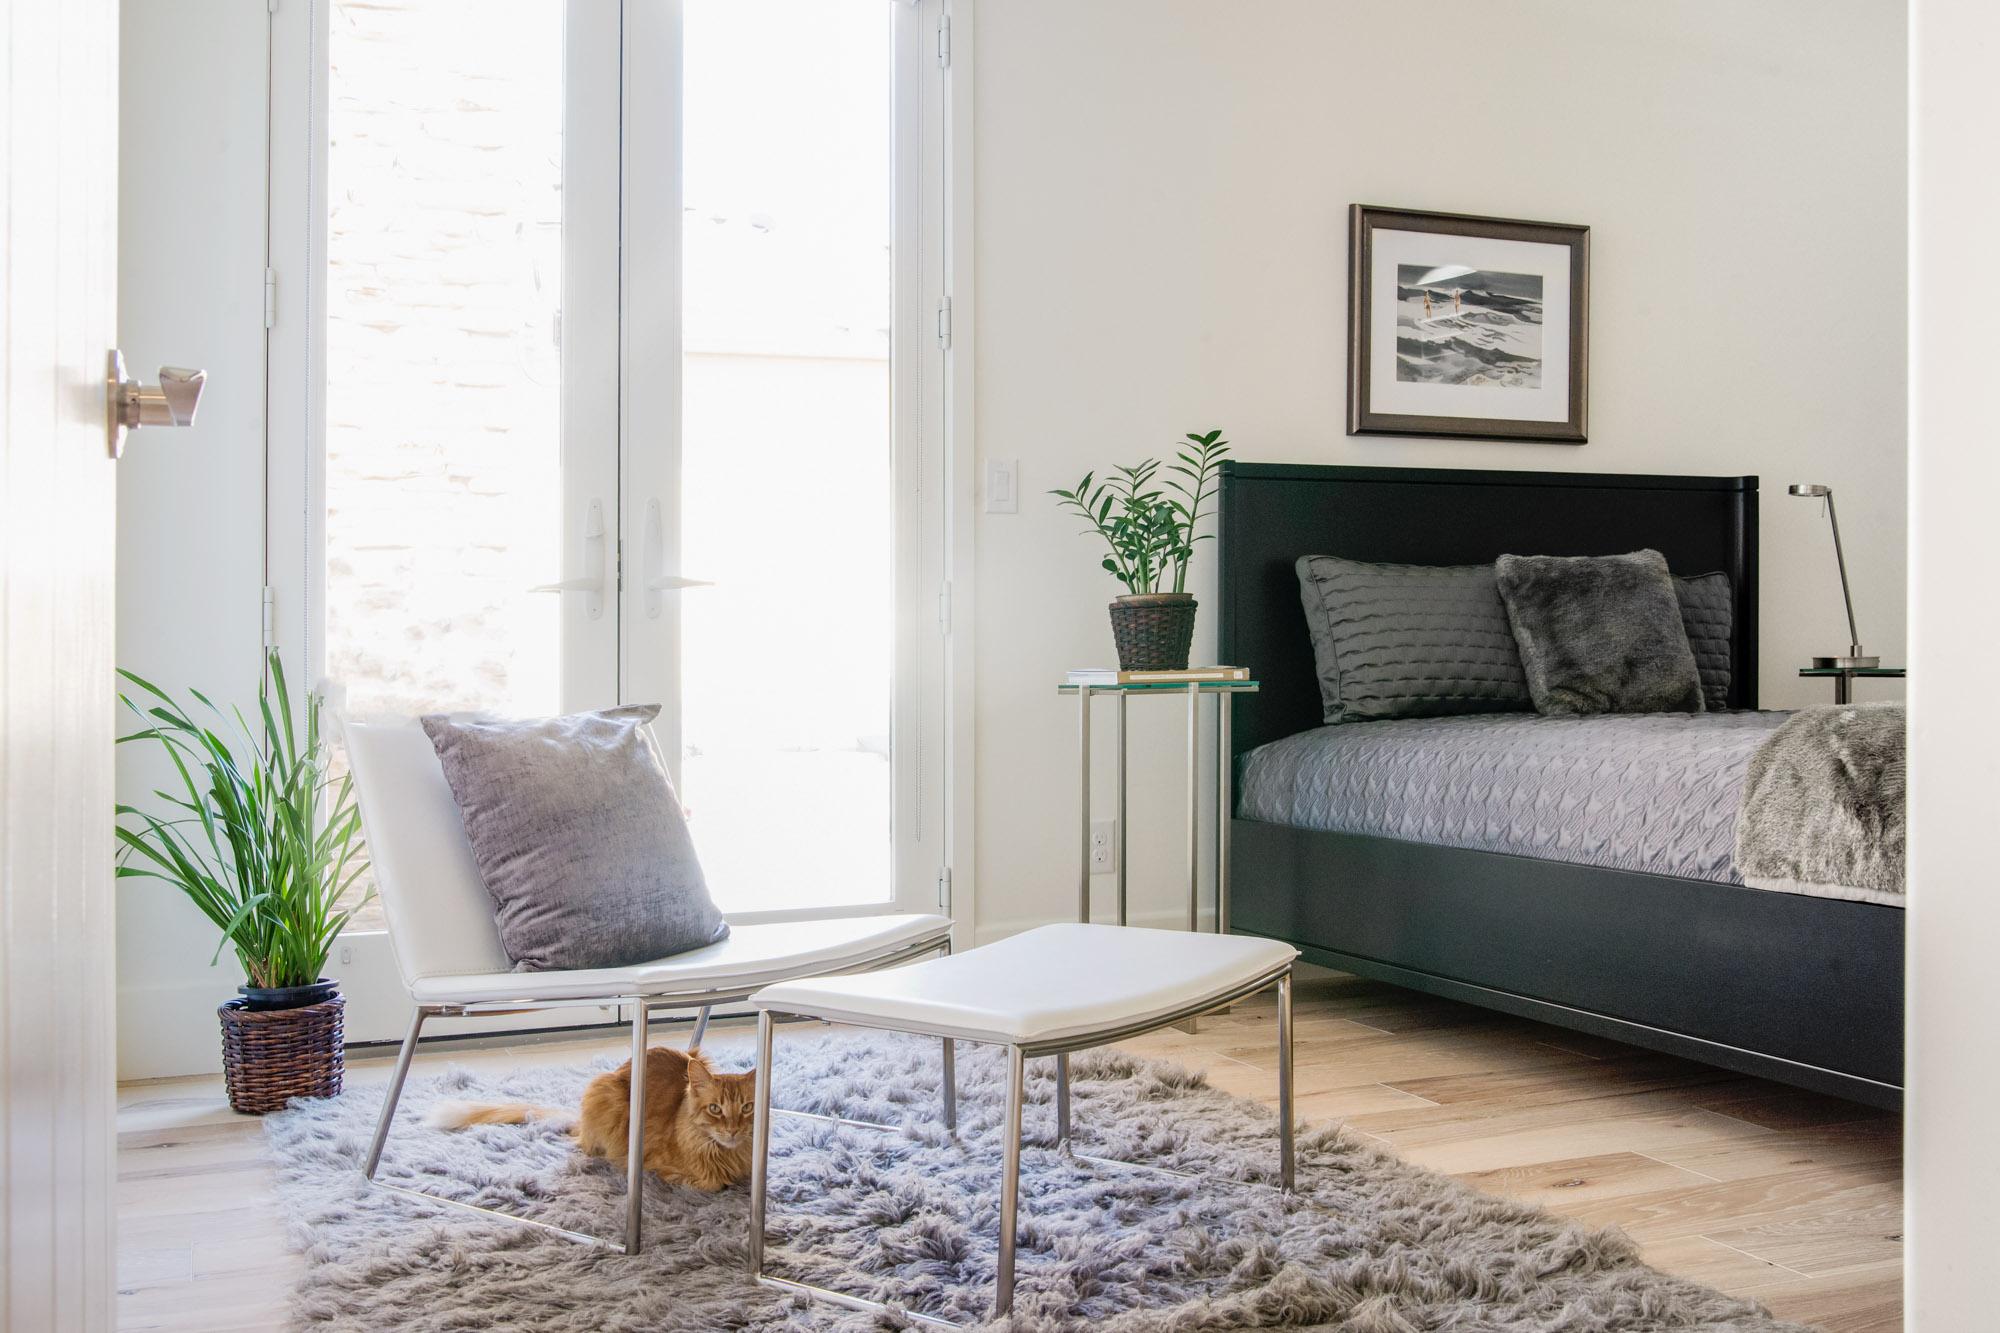 Mount Rose Estates bedroom interior design - Reno, Nevada - Kovac Design